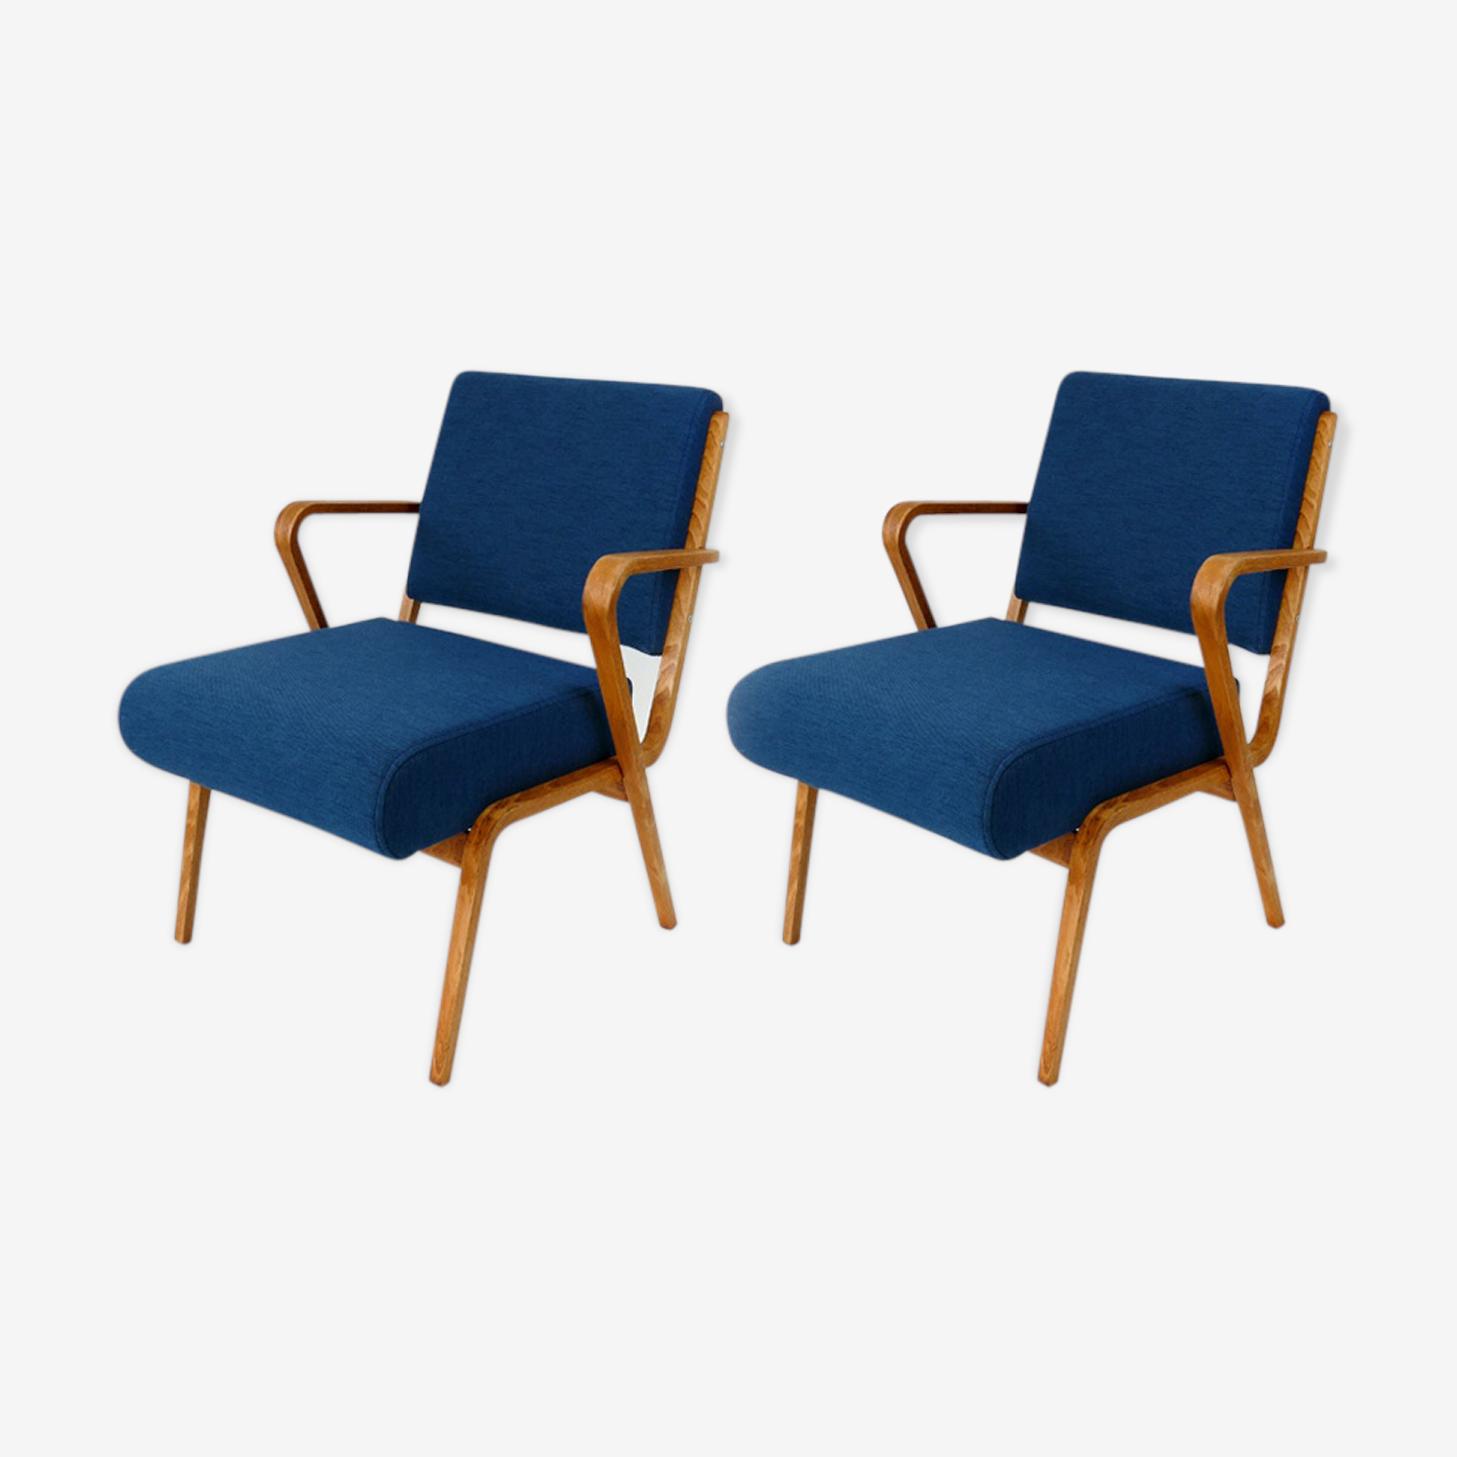 Pair of armchairs par Selman Selmanagic pour Veb Deutsche Werkstätten Hellerau